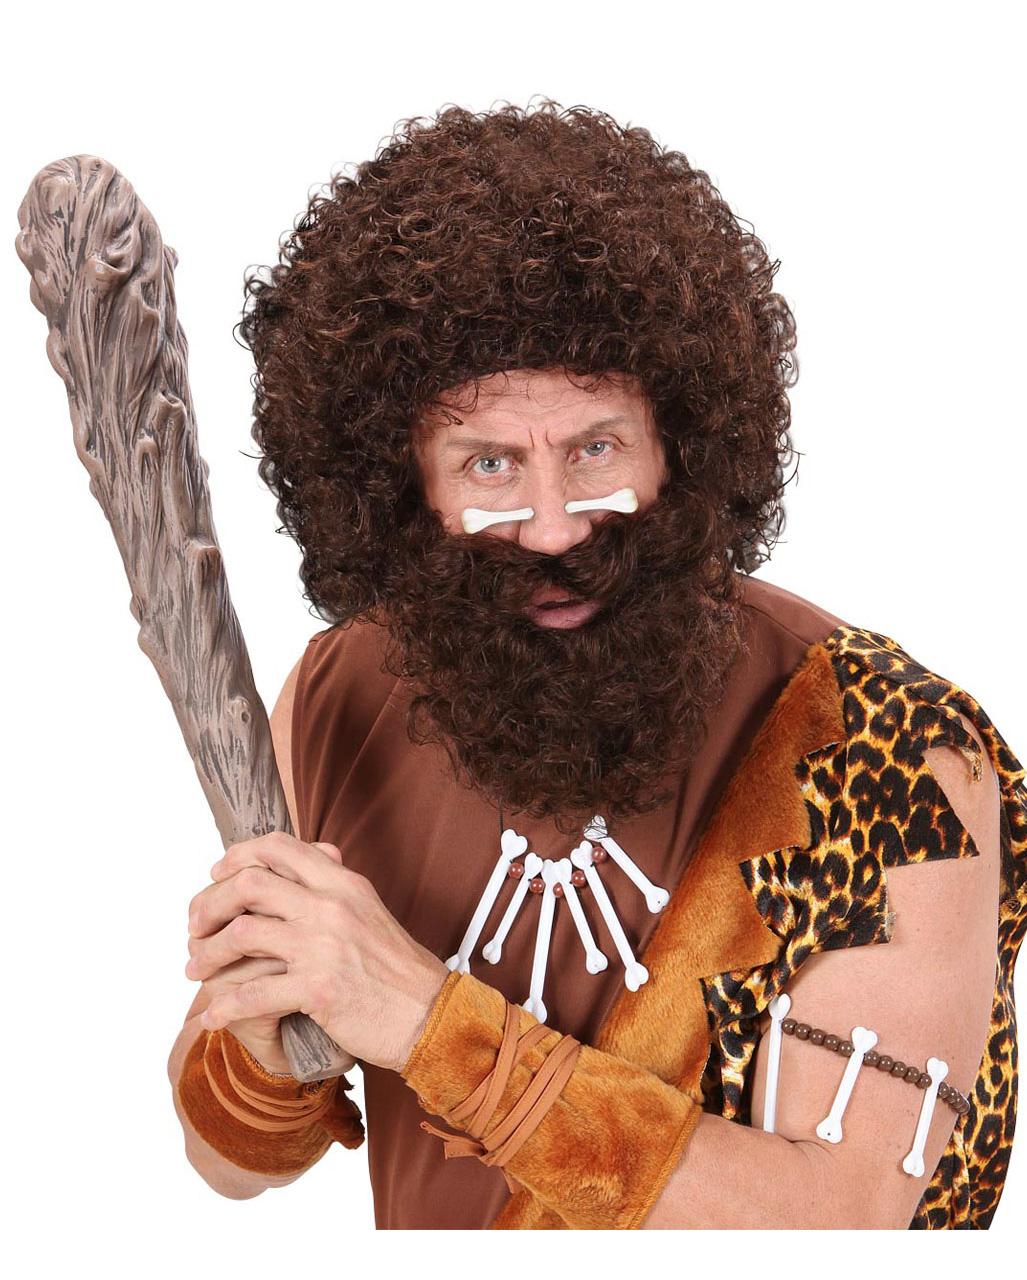 Stone Age Nasal Bone Neanderthal Nose Jewelry Horror Shop